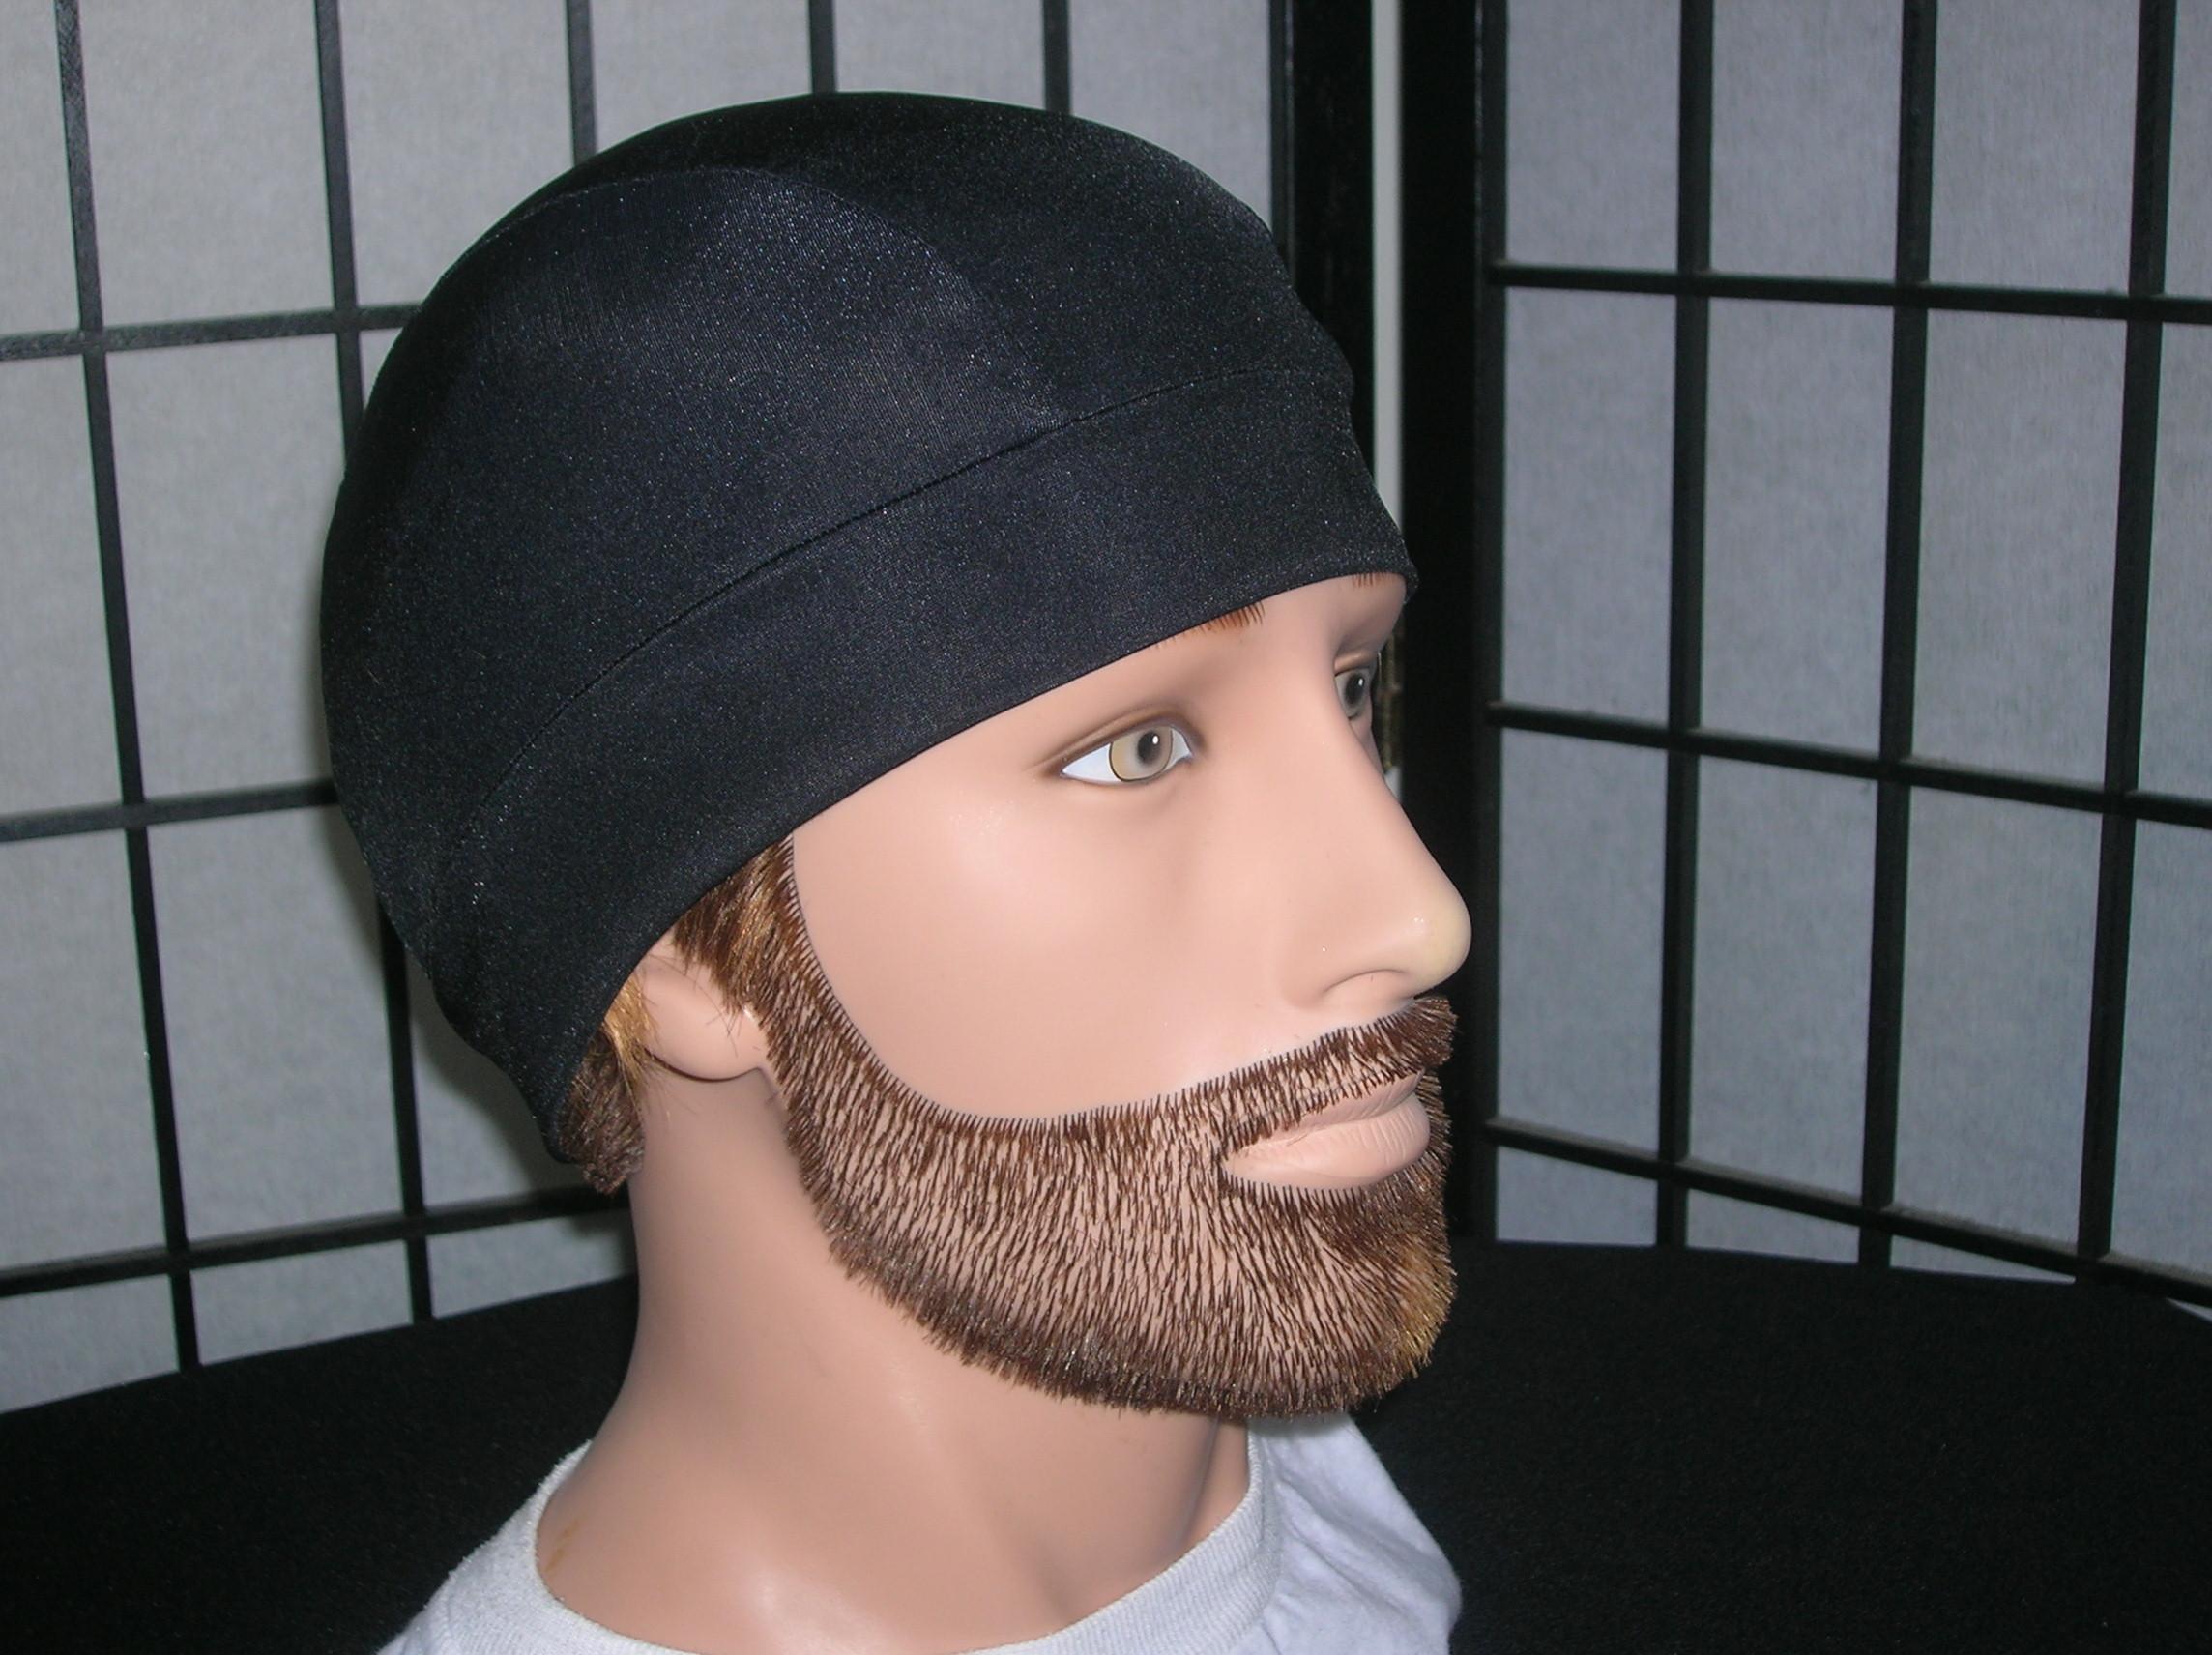 Black skull cap-men · Pizzazz Hats · Online Store Powered by Storenvy 25d578d63c4